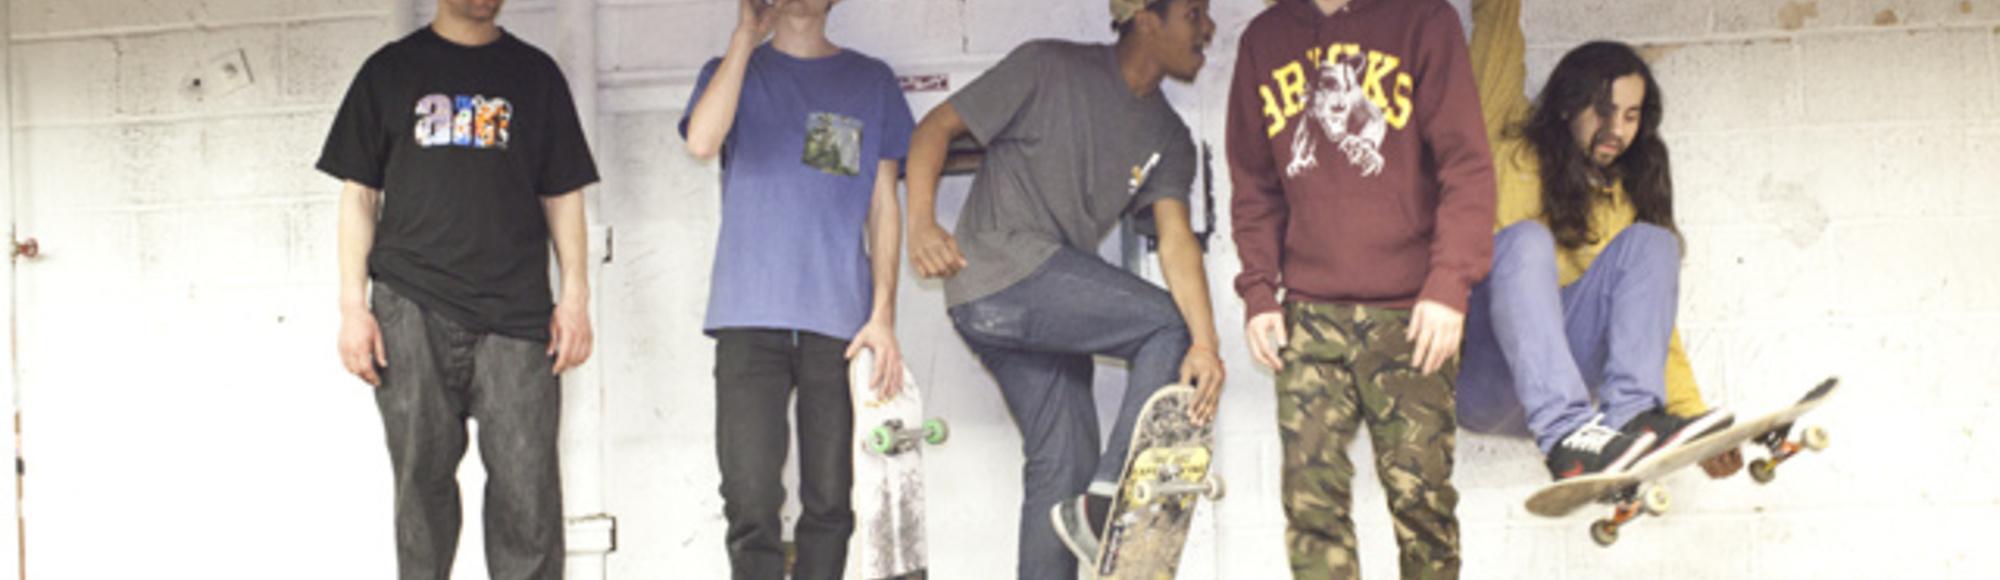 Taji's Mahal - After Hours at Skate Brooklyn